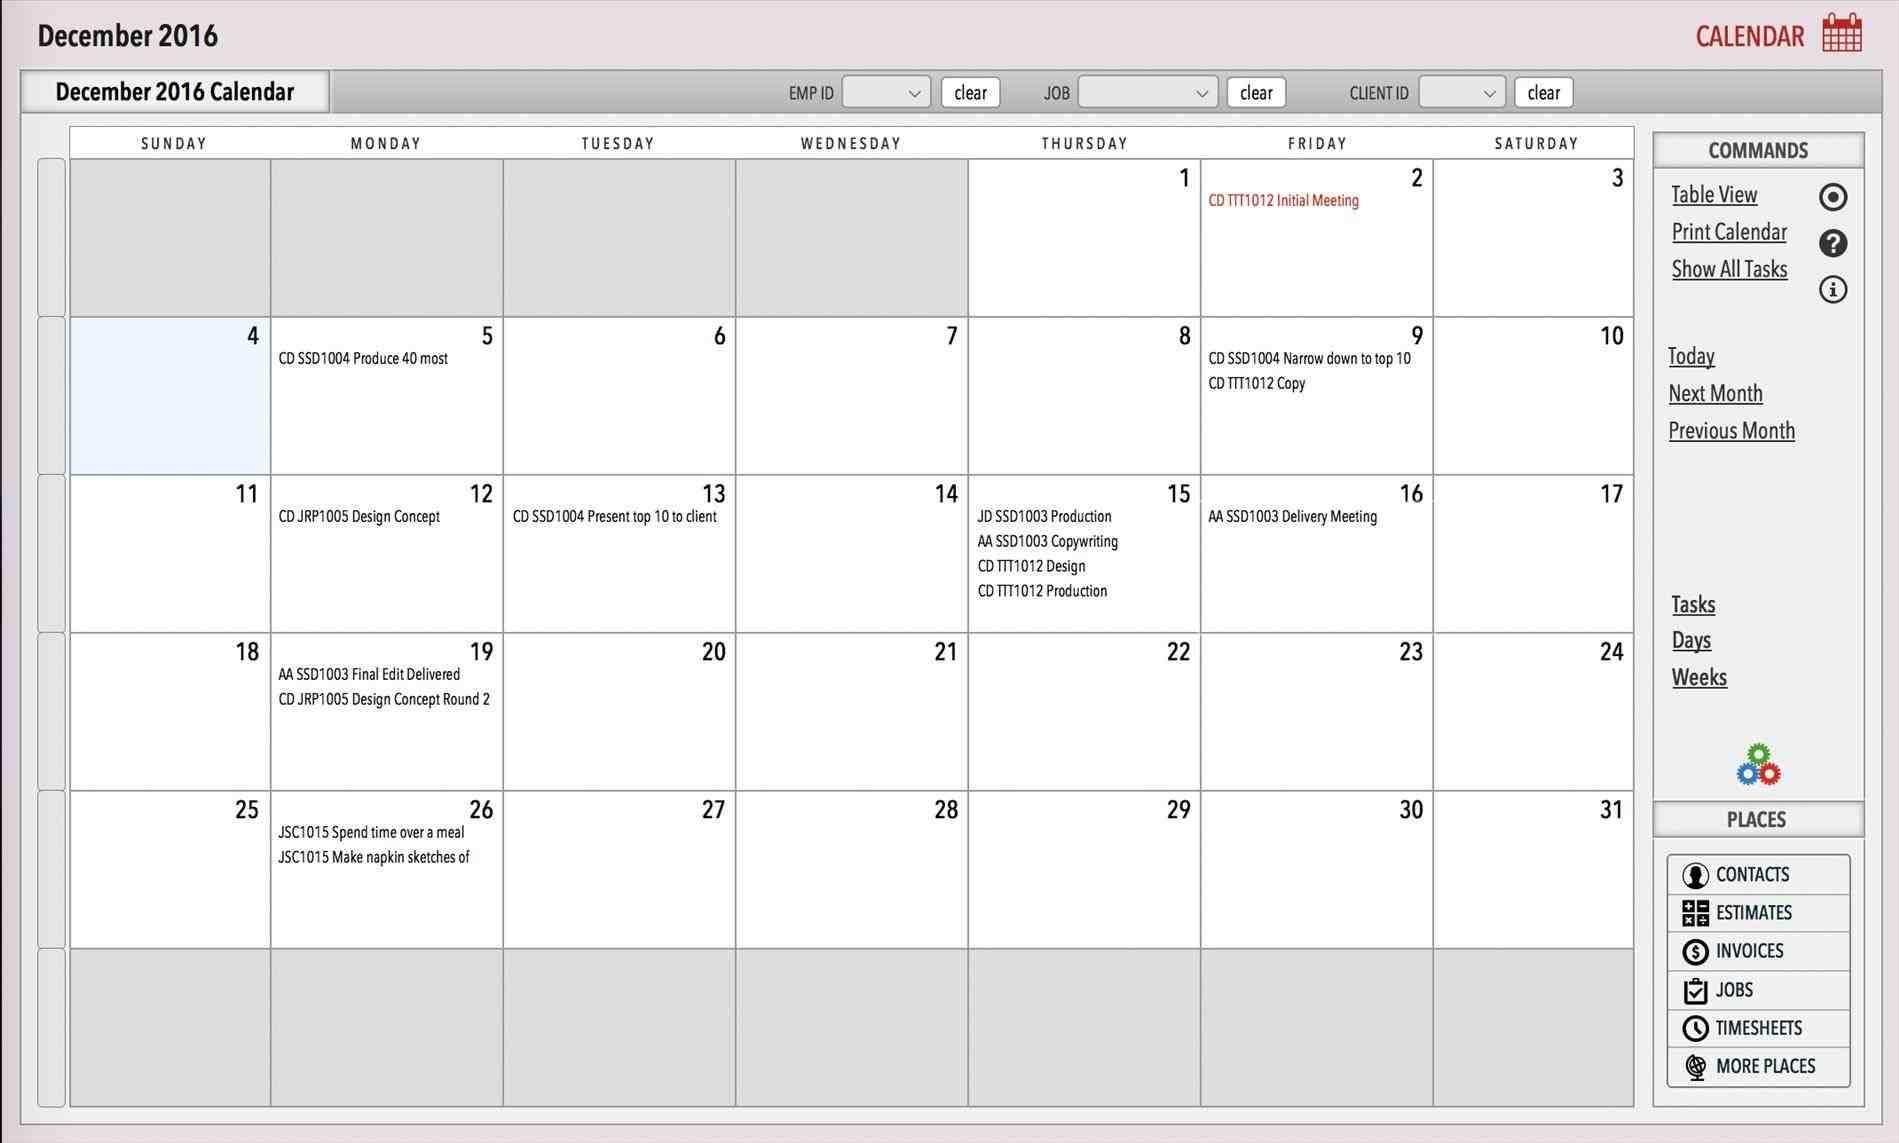 Work Calendars calendars commonpenceco vacation planner vacation Employee Work Calendars planner employee shift schedule generator awesome work calendar template employee